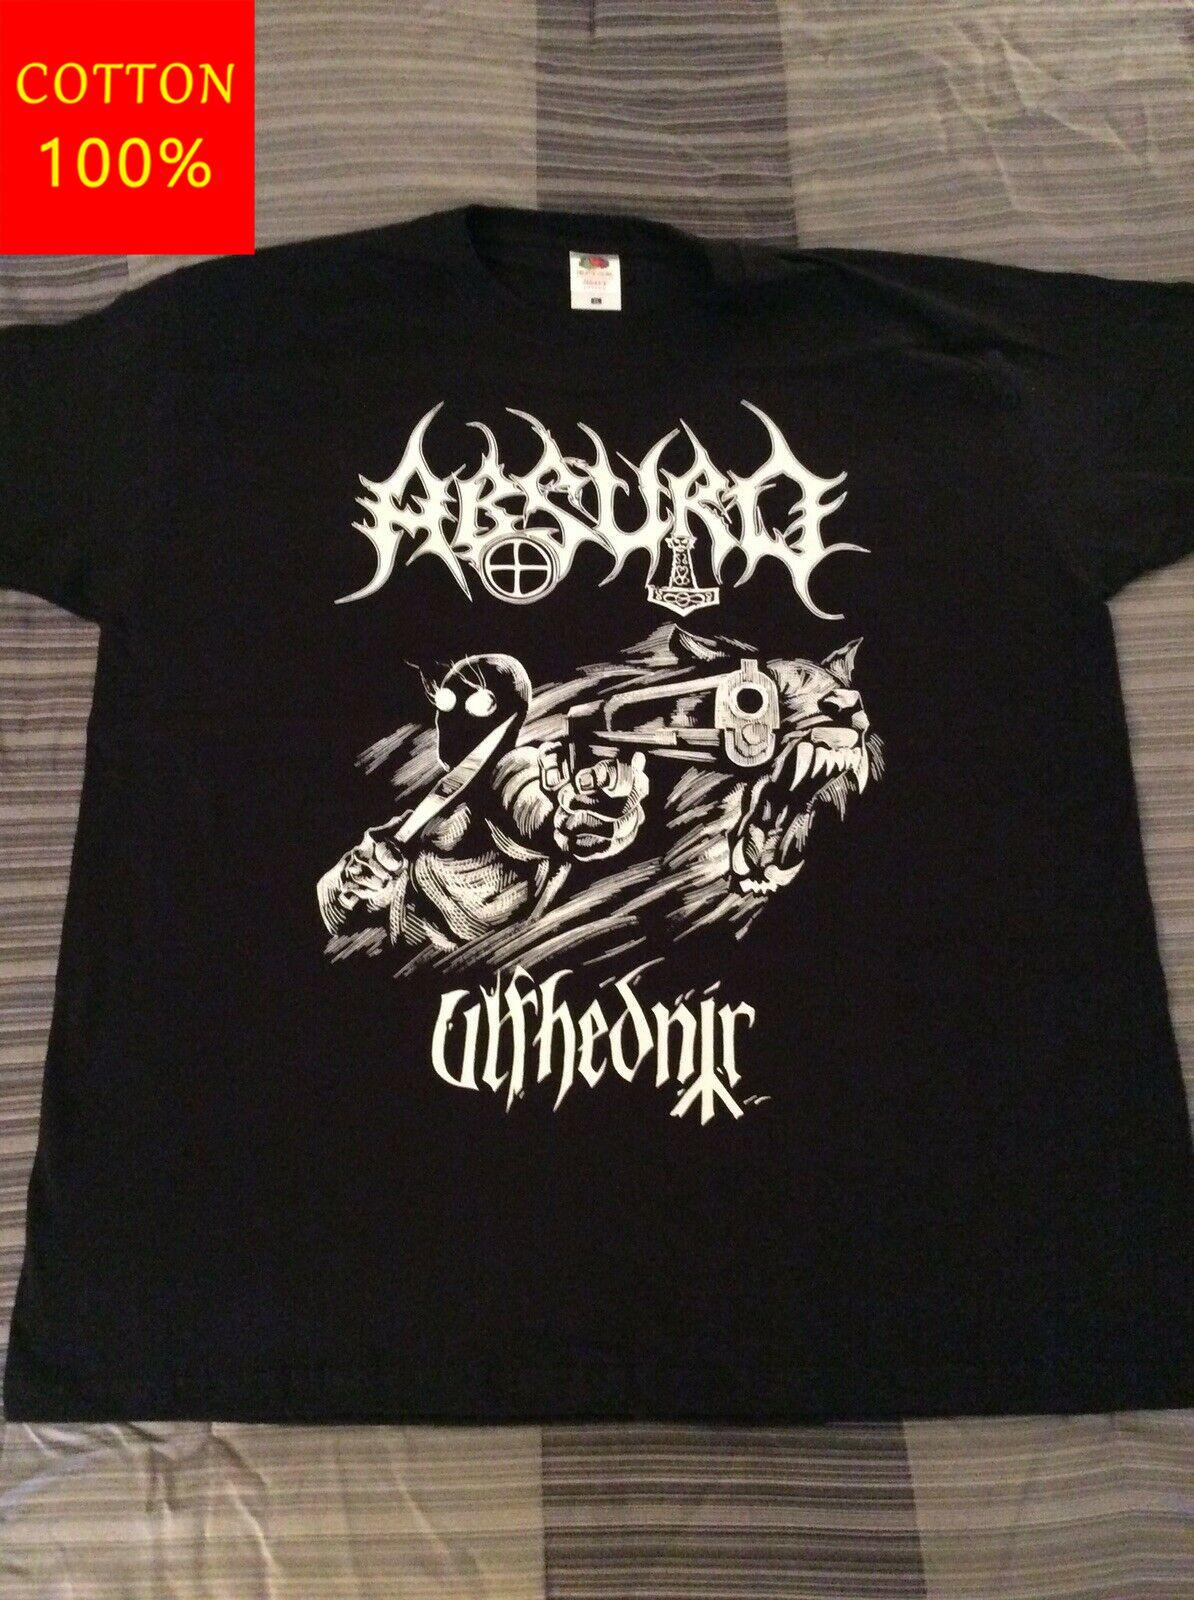 Absurdo ulfhednir camisa xl goatmoon taake 1burzum darkthrone o chasmulver t marca roupas engraçado camiseta topo